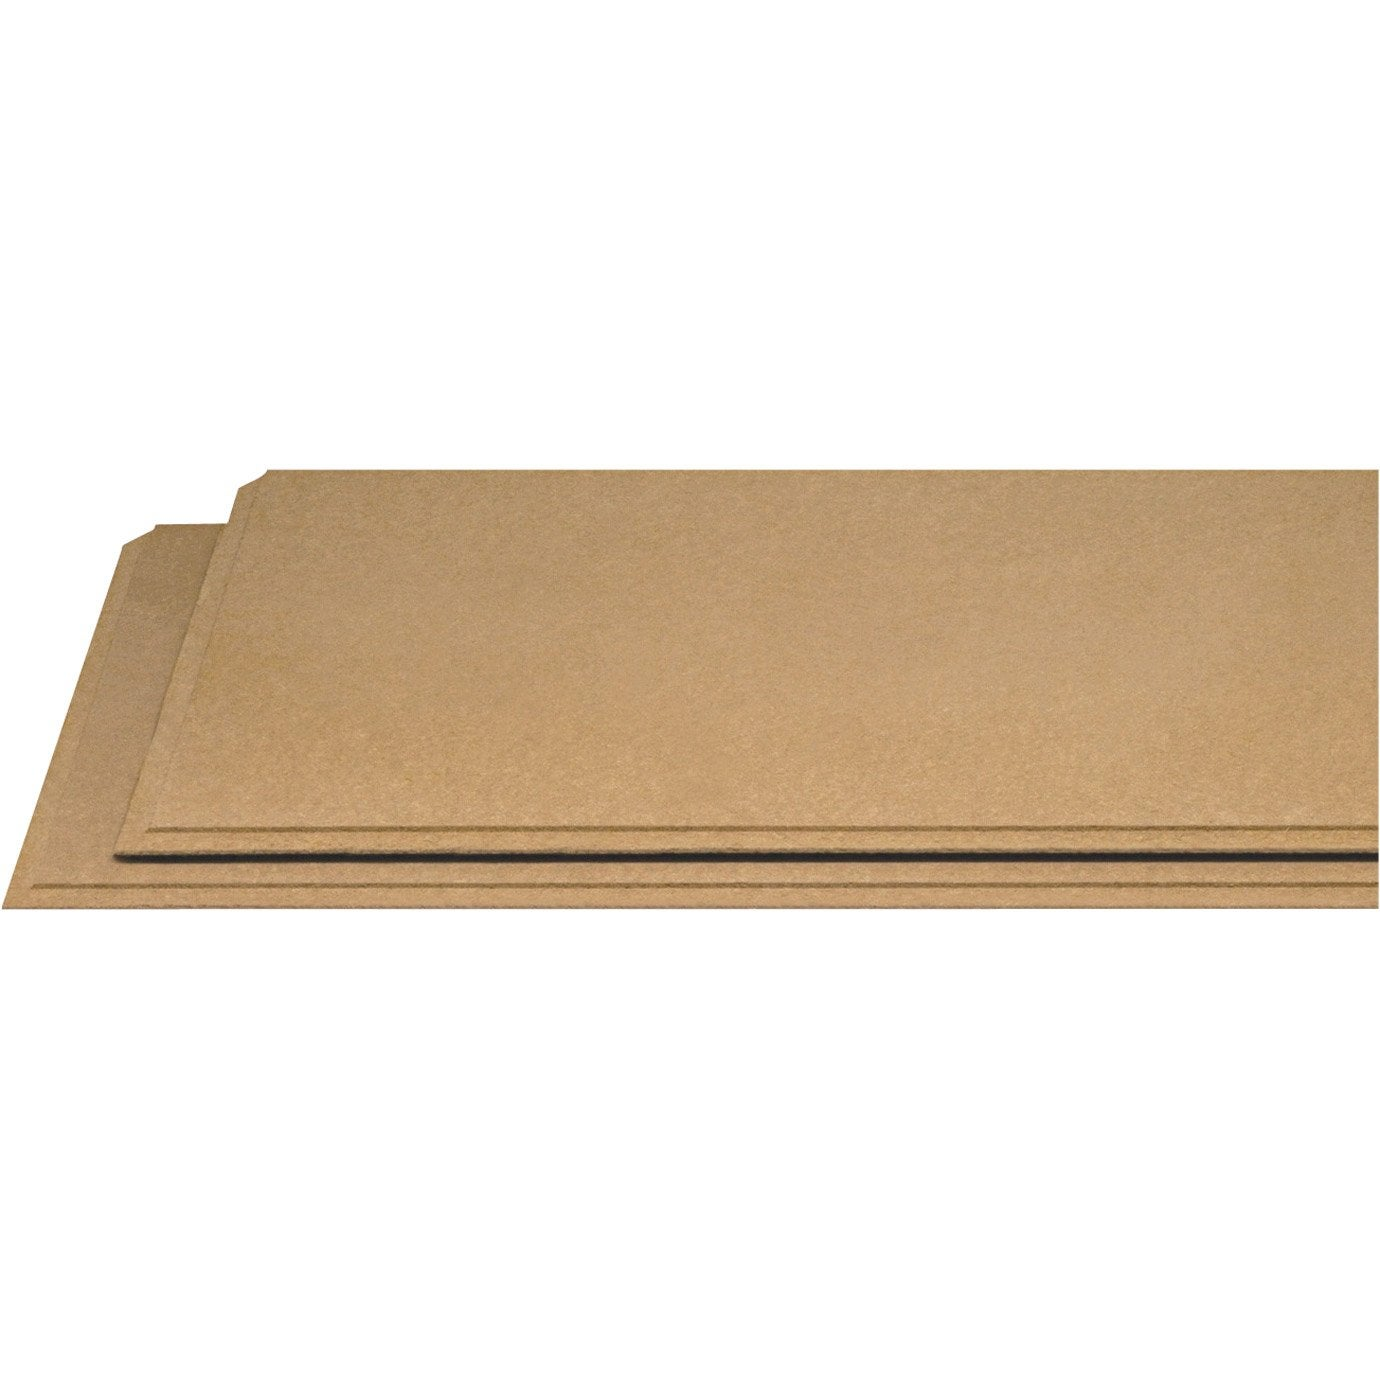 panneau en fibre de bois agepan 230 hd r leroy merlin. Black Bedroom Furniture Sets. Home Design Ideas